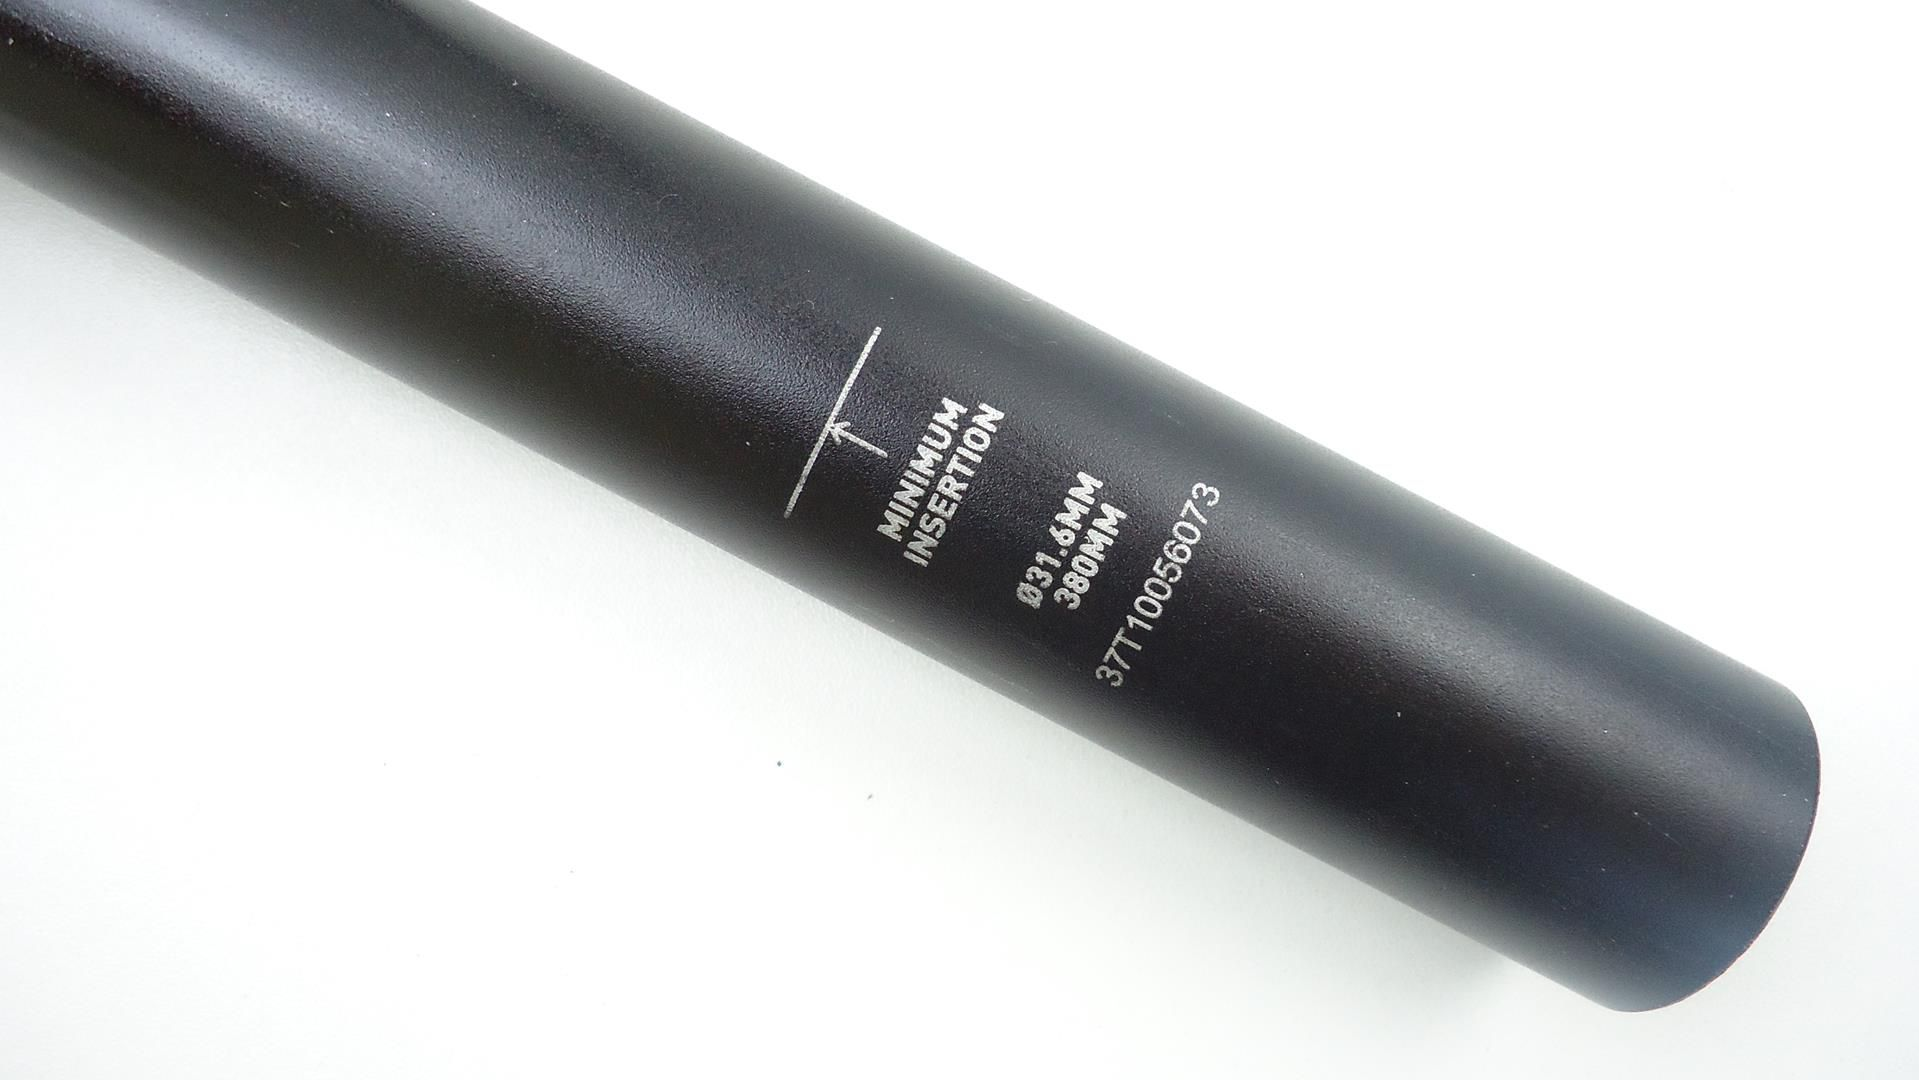 Canote MTB Rock Shox Reverb 31.6 x 380mm Externo Telescópico Retrátil Preto - USADO